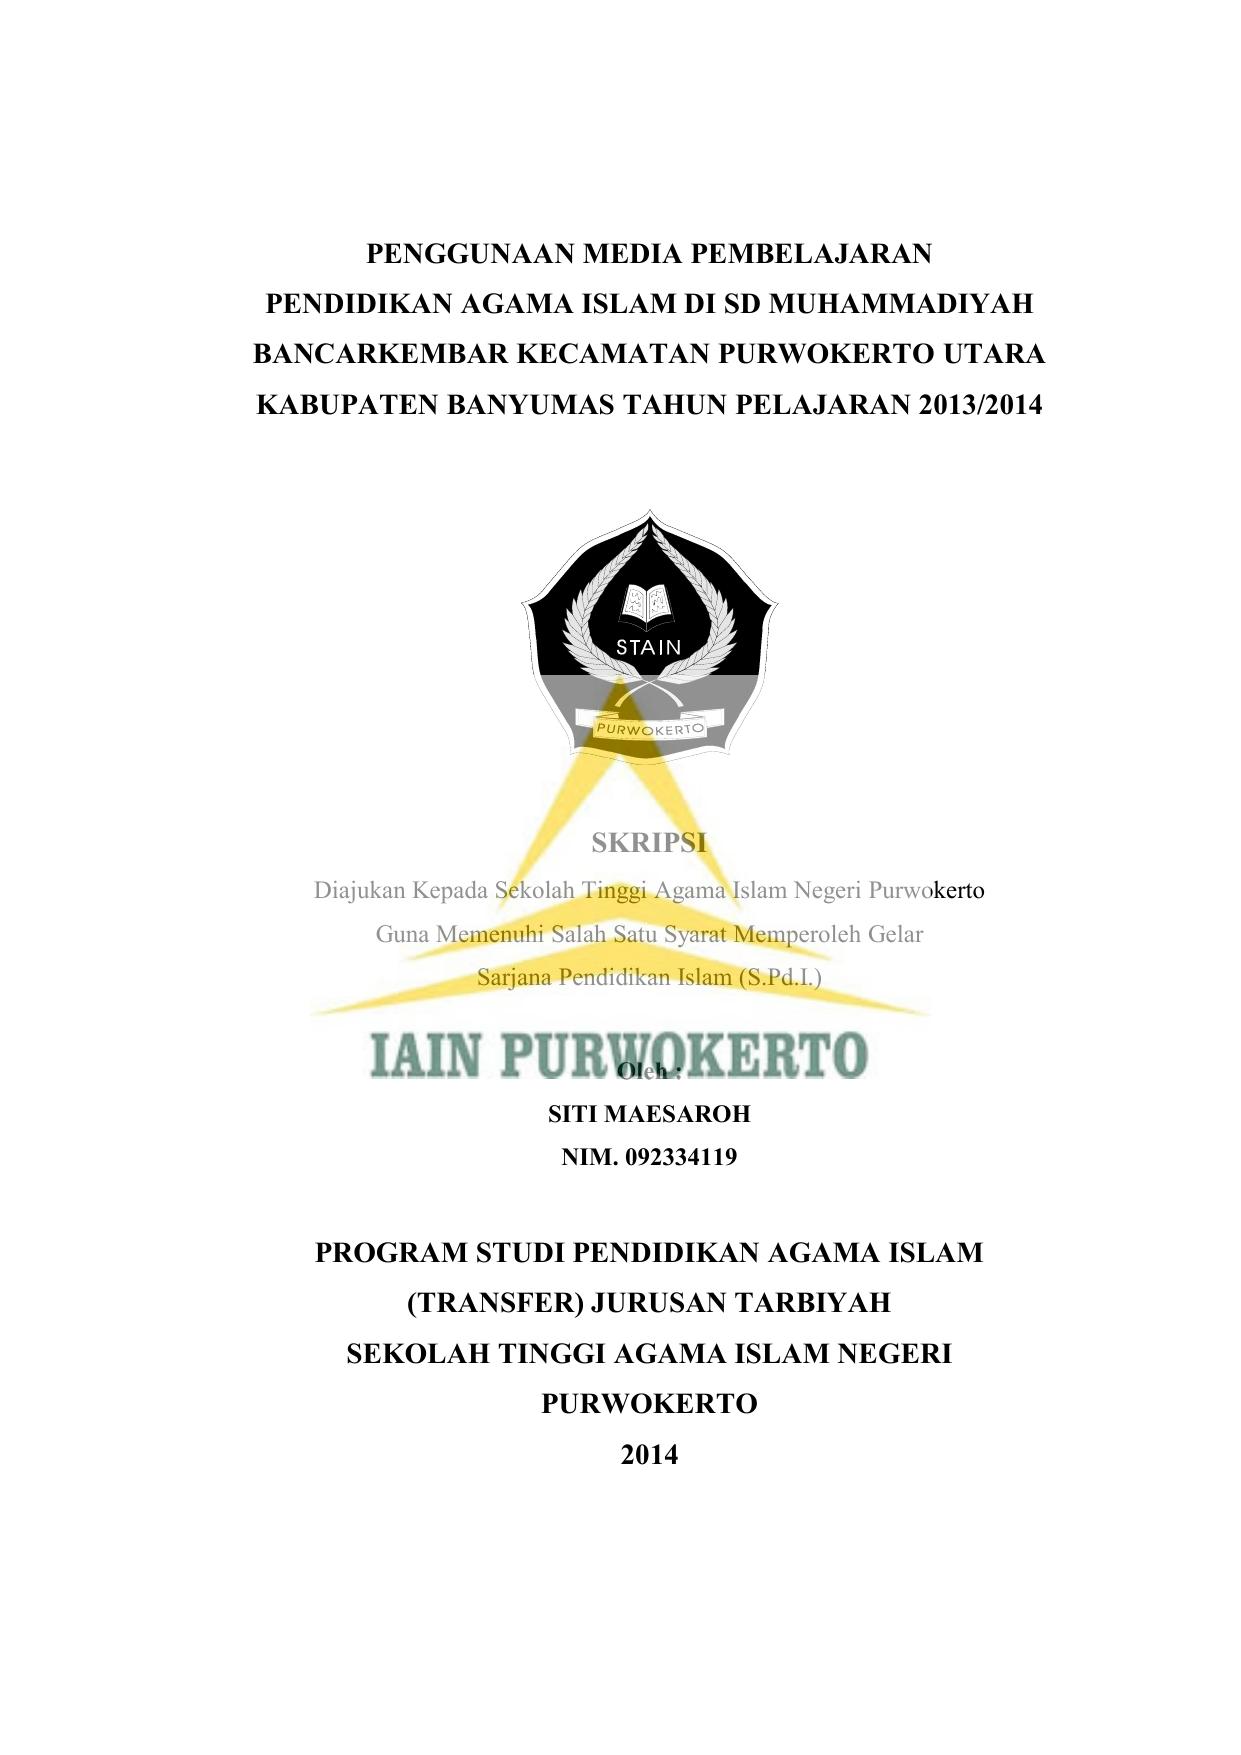 Penggunaan Media Pembelajaran Pendidikan Agama Islam Di Sd